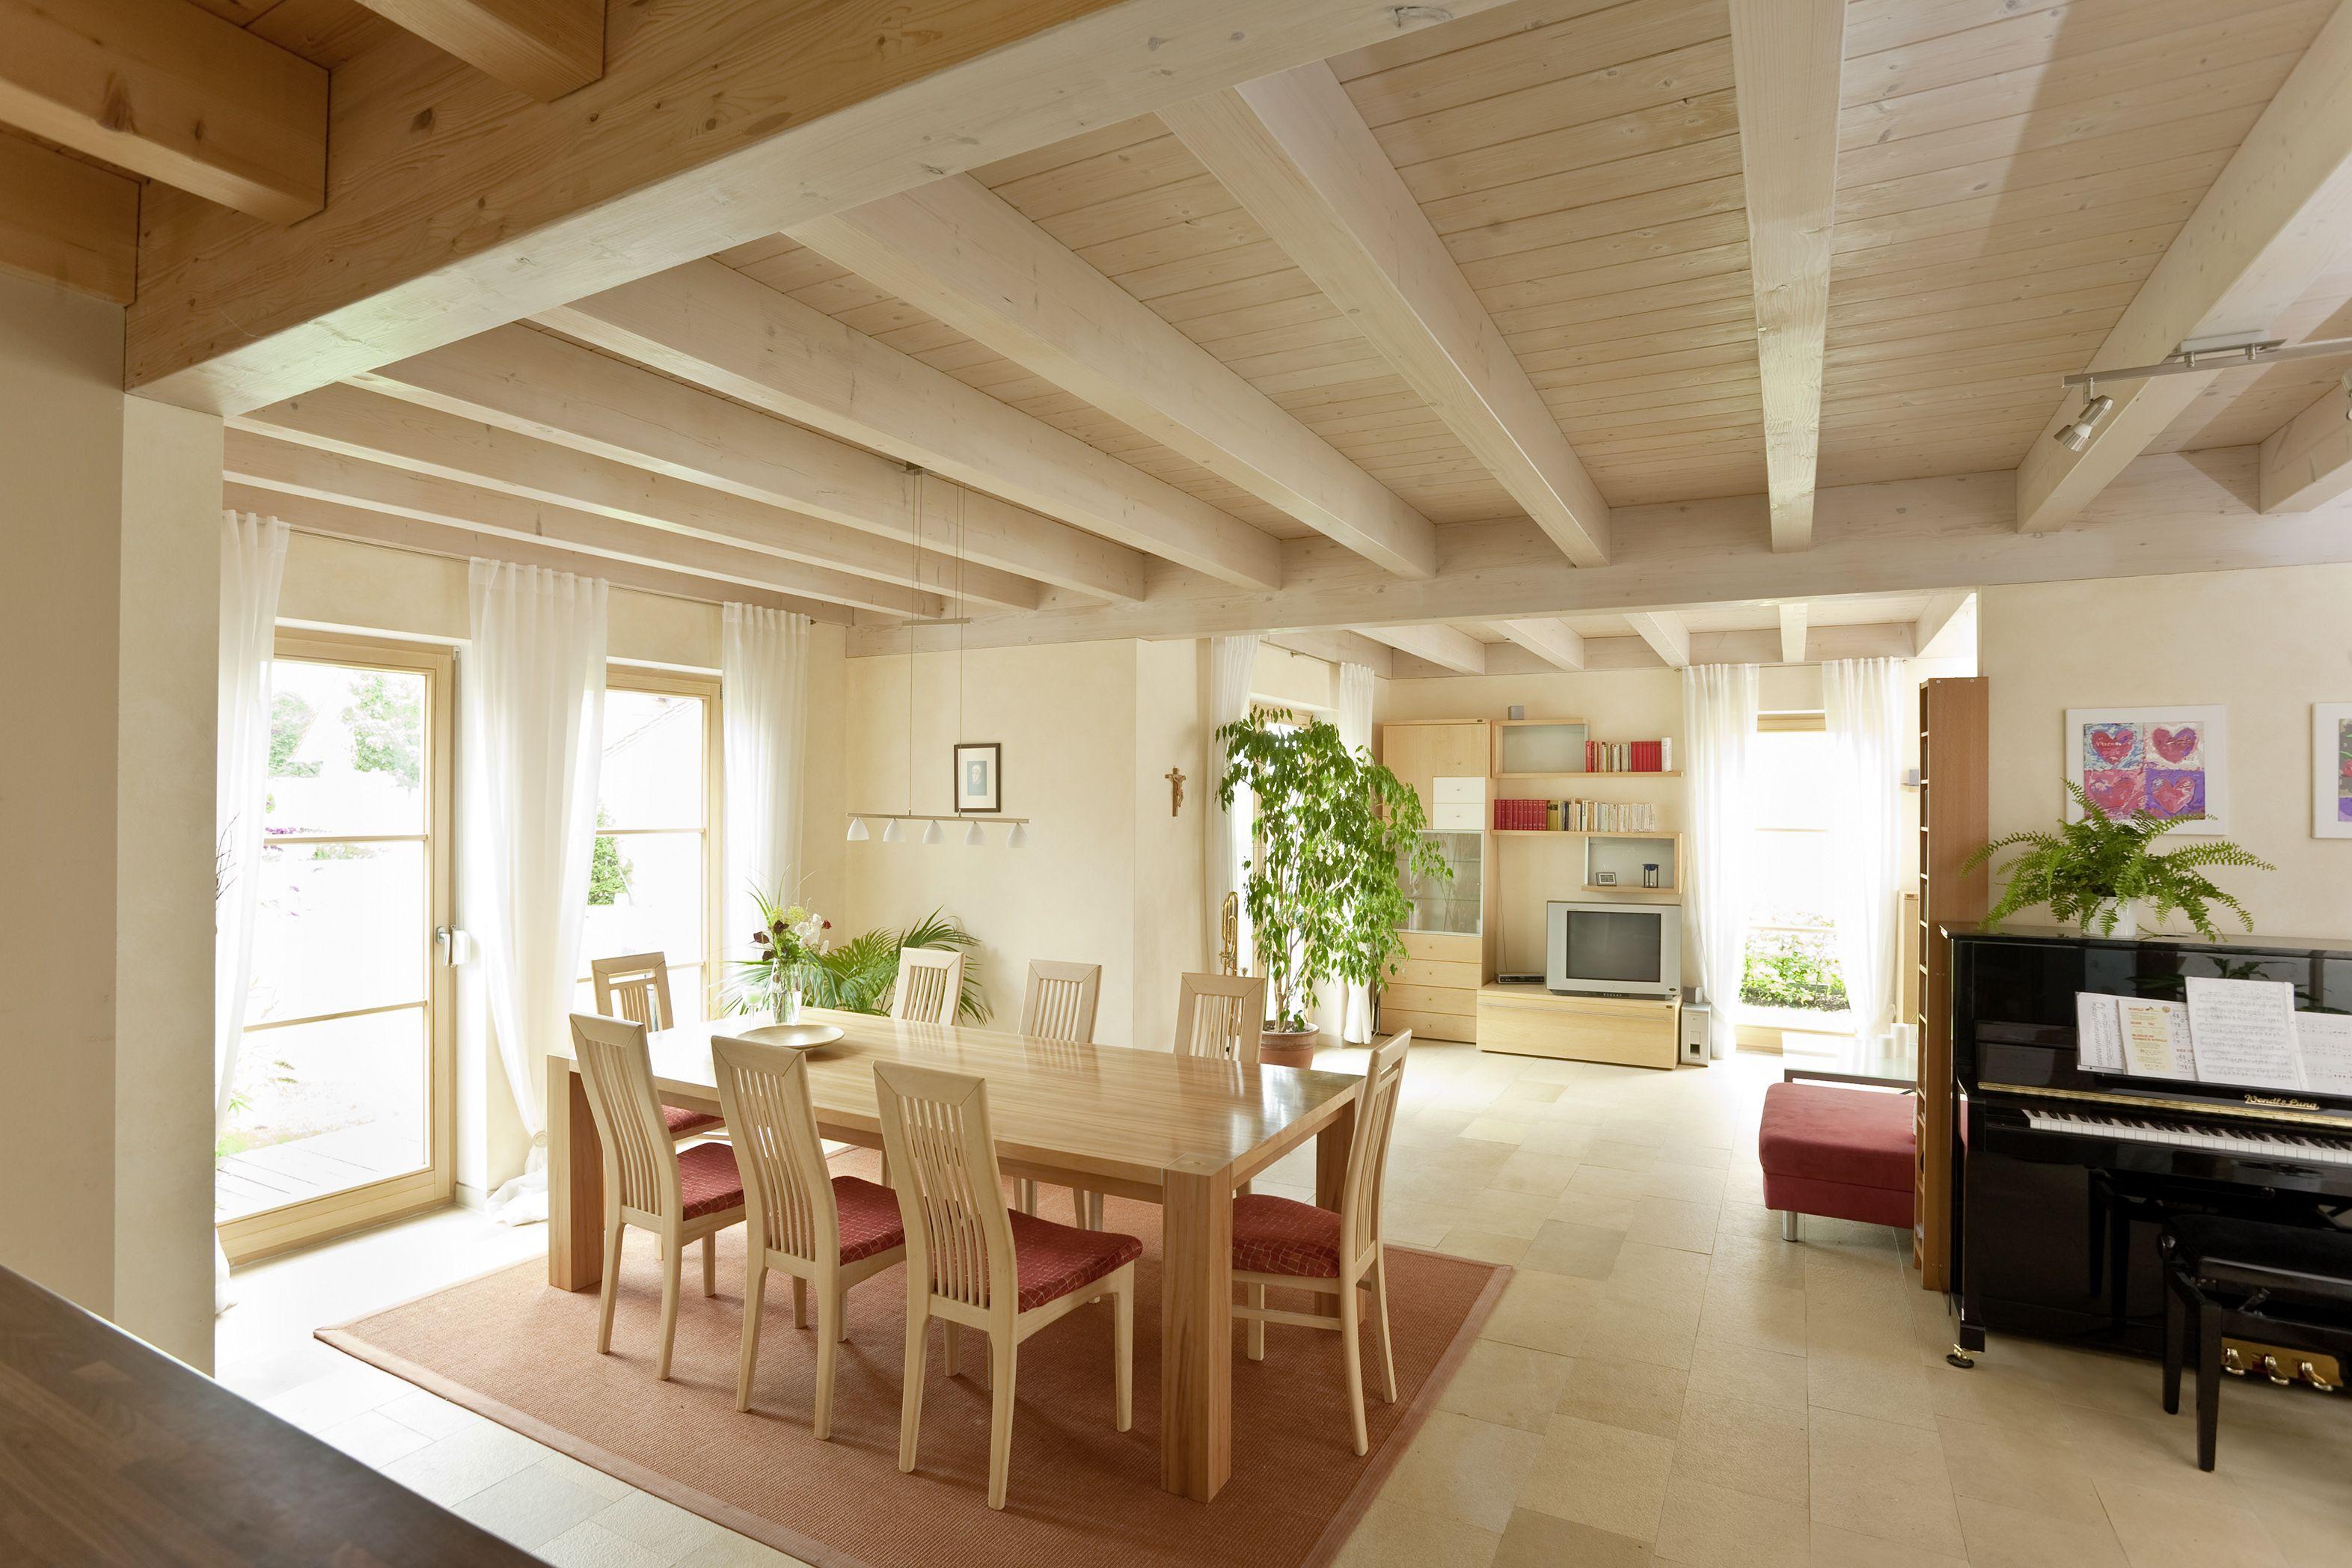 Heller Essbereich Im Grosszugigen Holzhaus Holzhaus Holz Esszimmer